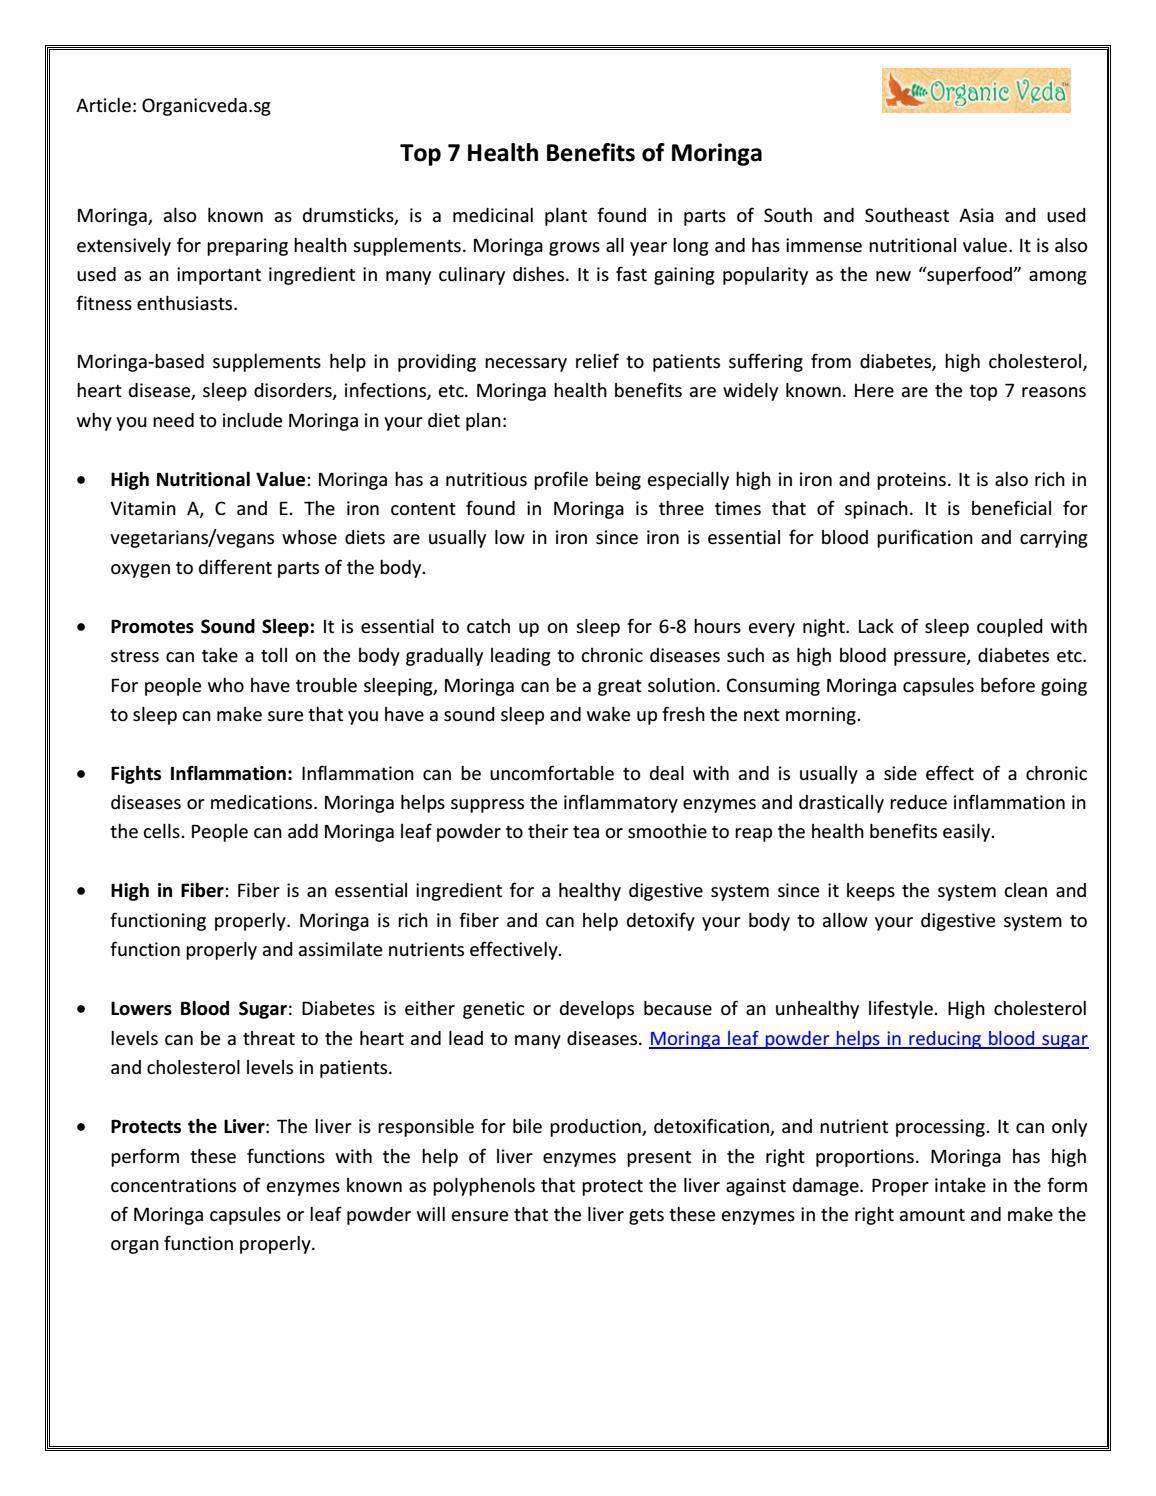 Top 7 health benefits of moringa